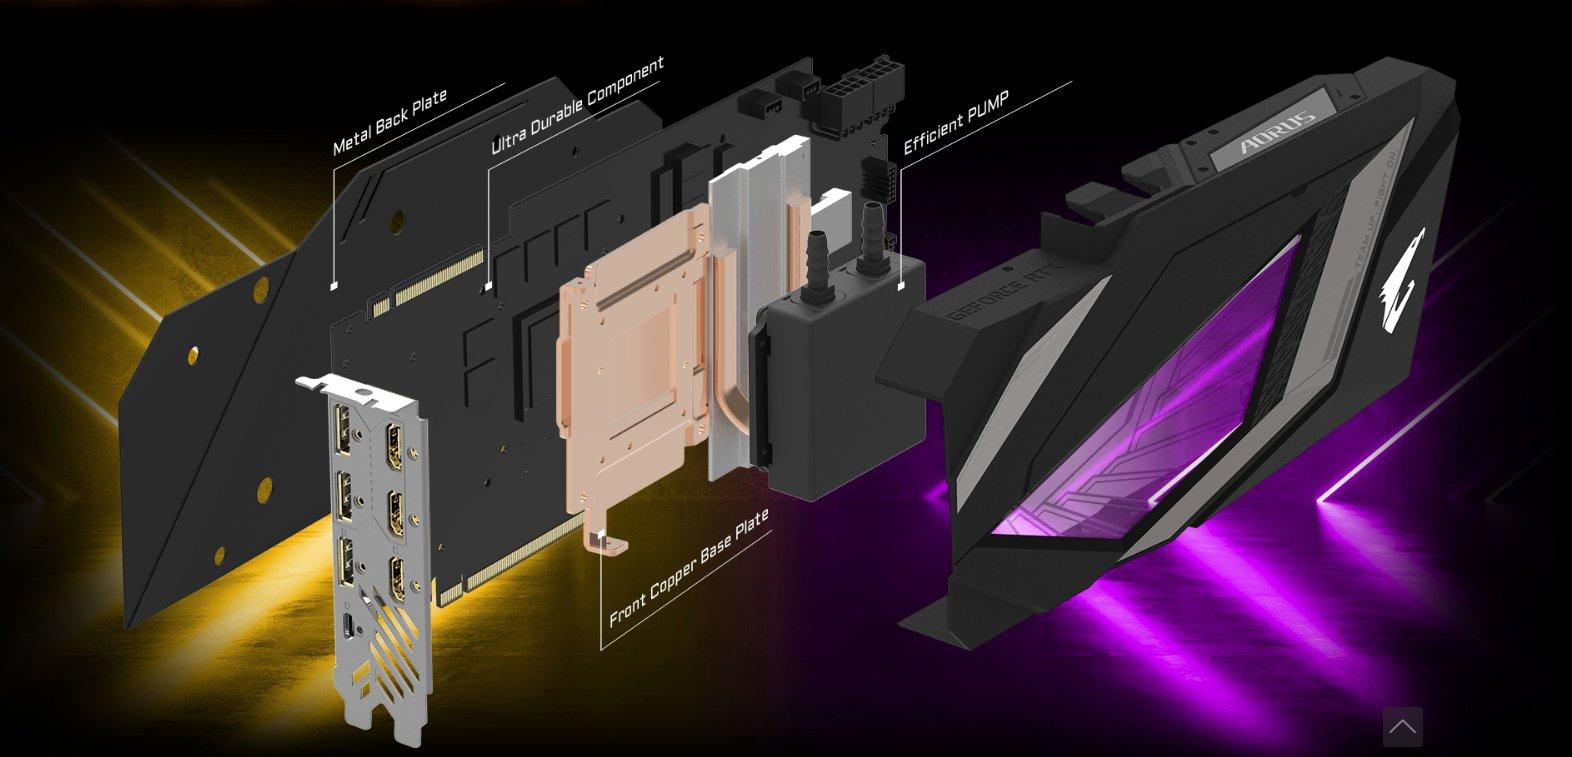 Gigabyte GeForce RTX 2080 (Ti) Aorus Xtreme Waterforce